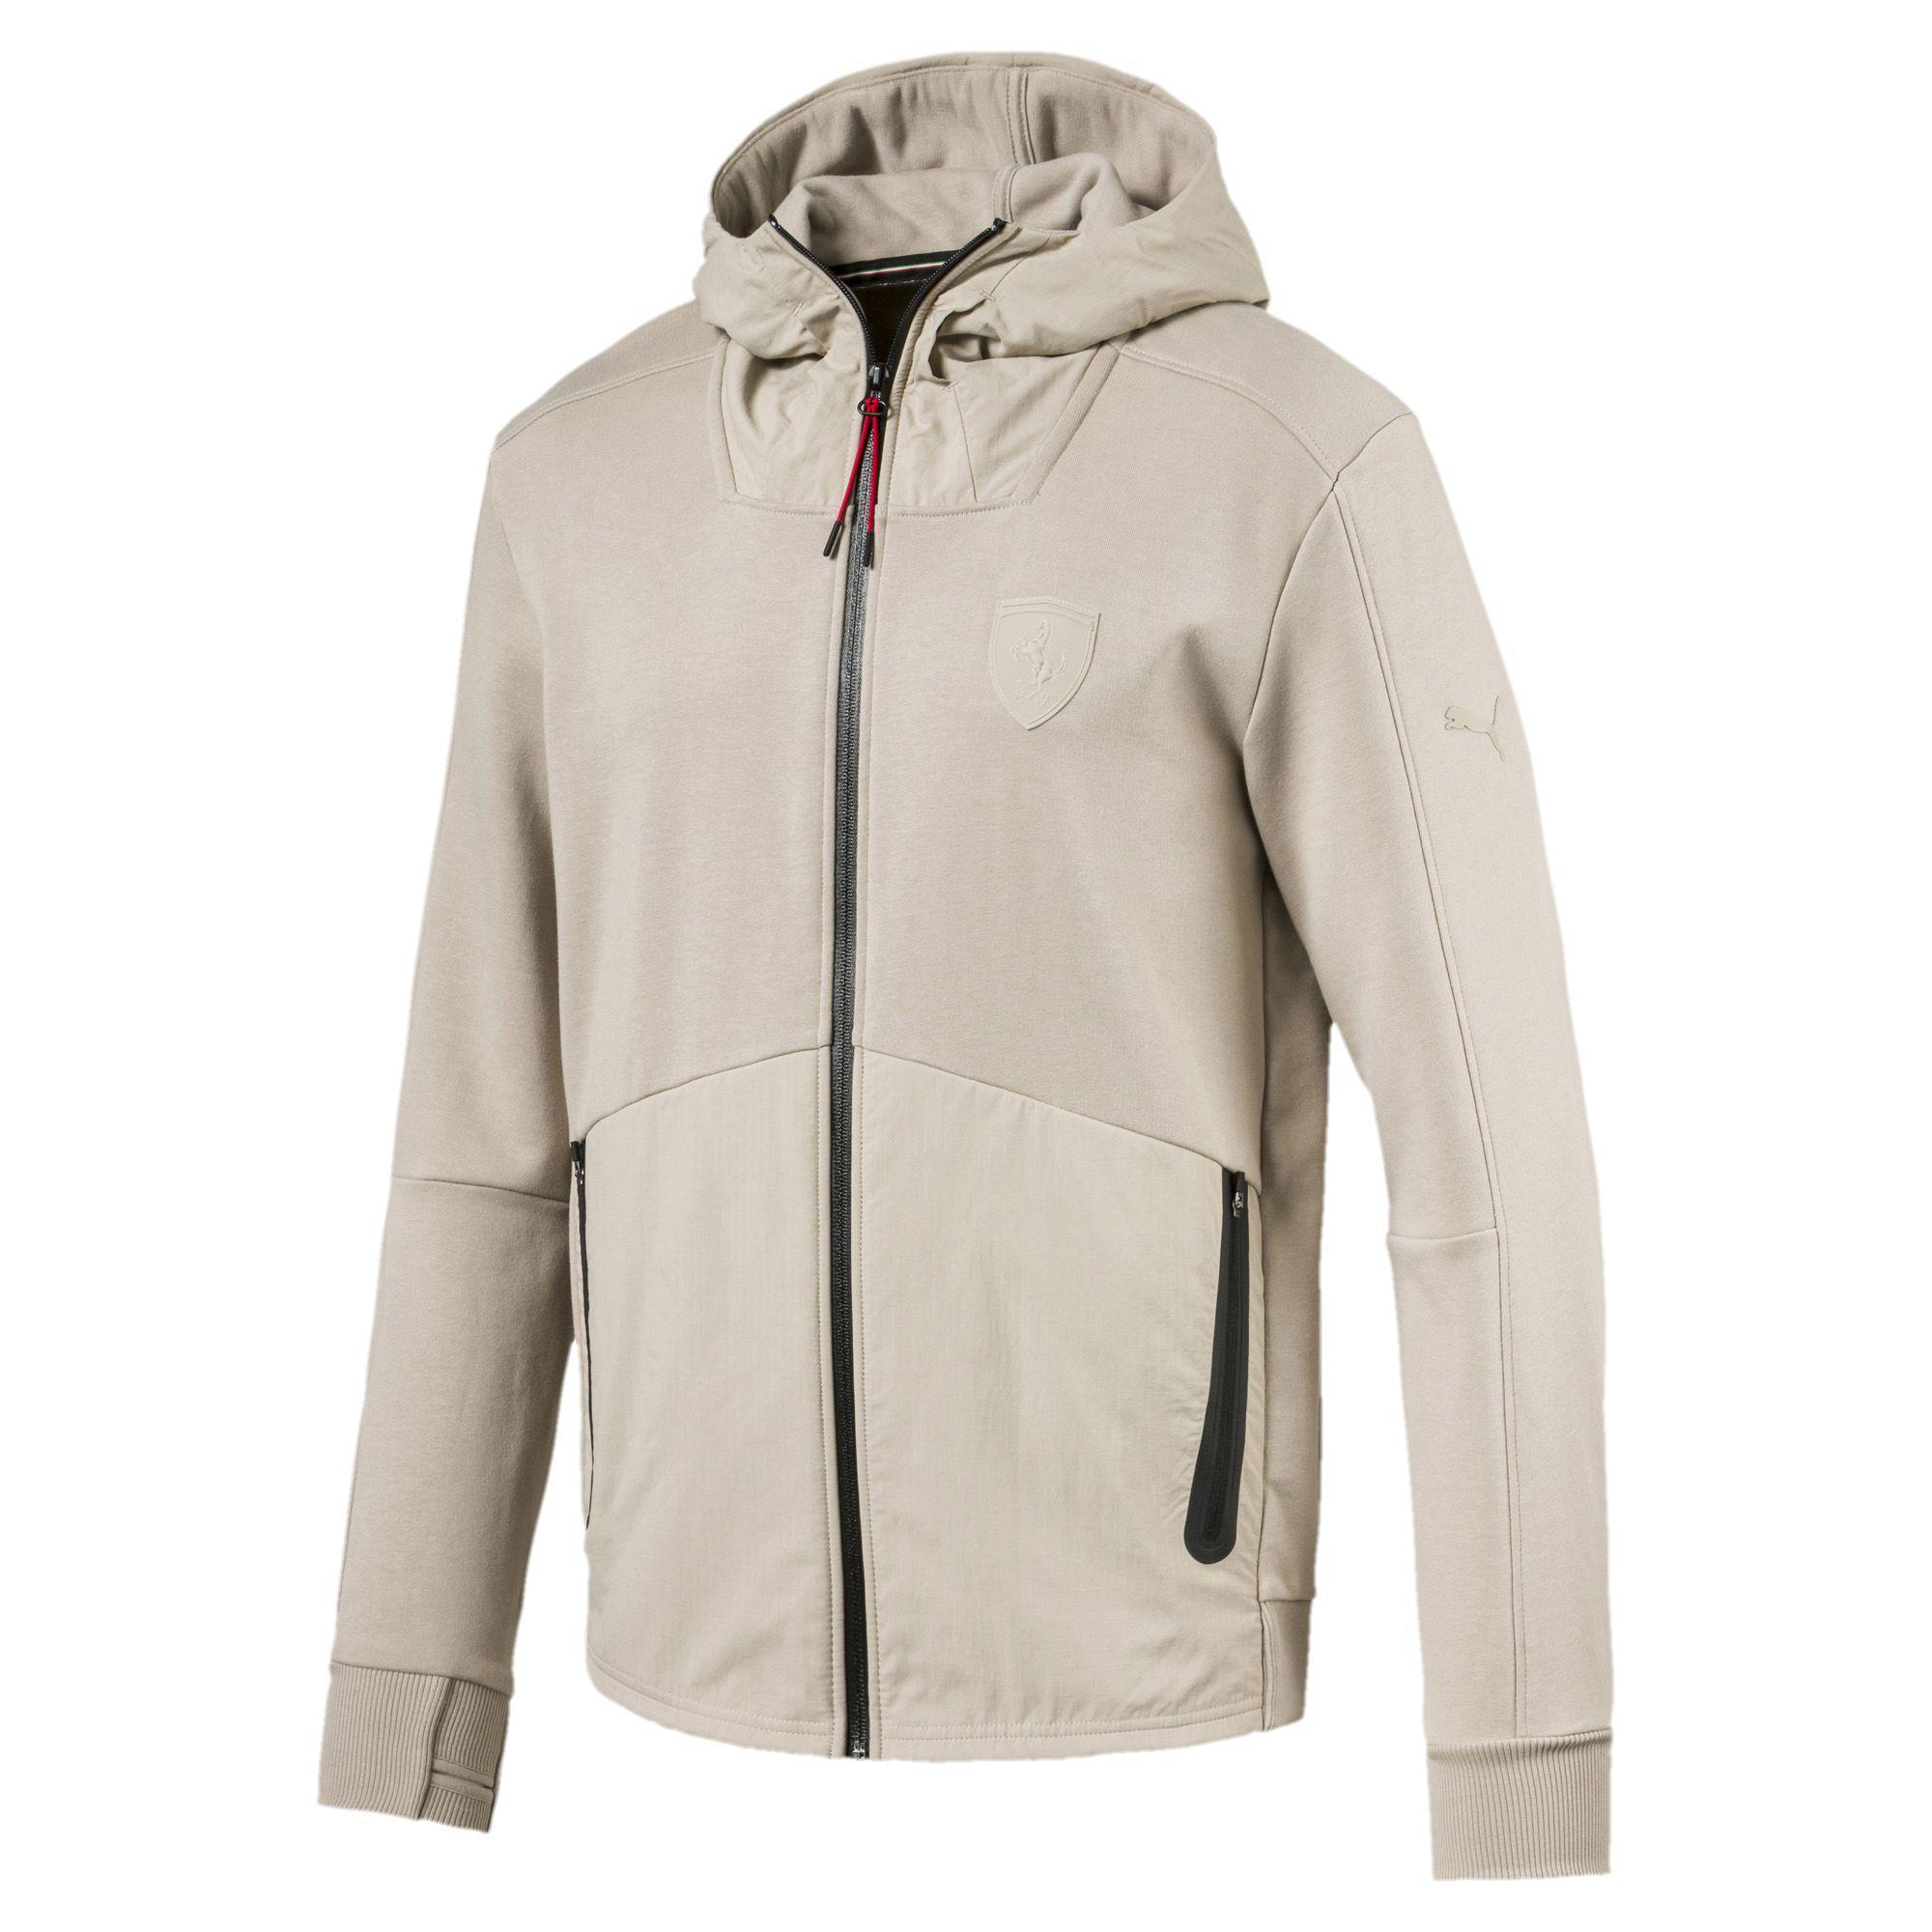 44c62476d0b3 Lyst - PUMA Ferrari Lifestyle Hooded Sweat Jacket for Men